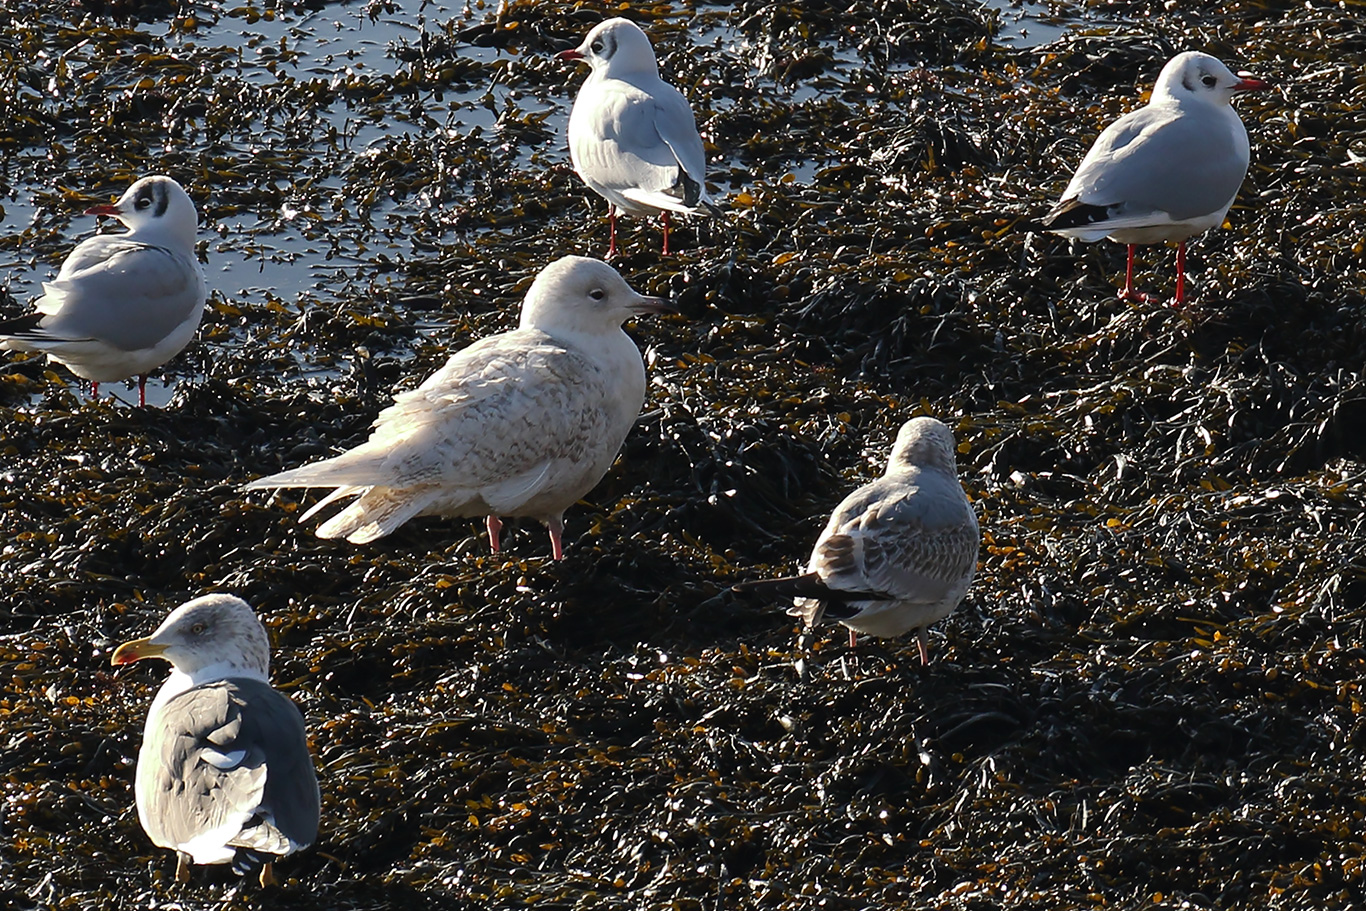 Iceland Gull, Co. Wexford, Ireland.